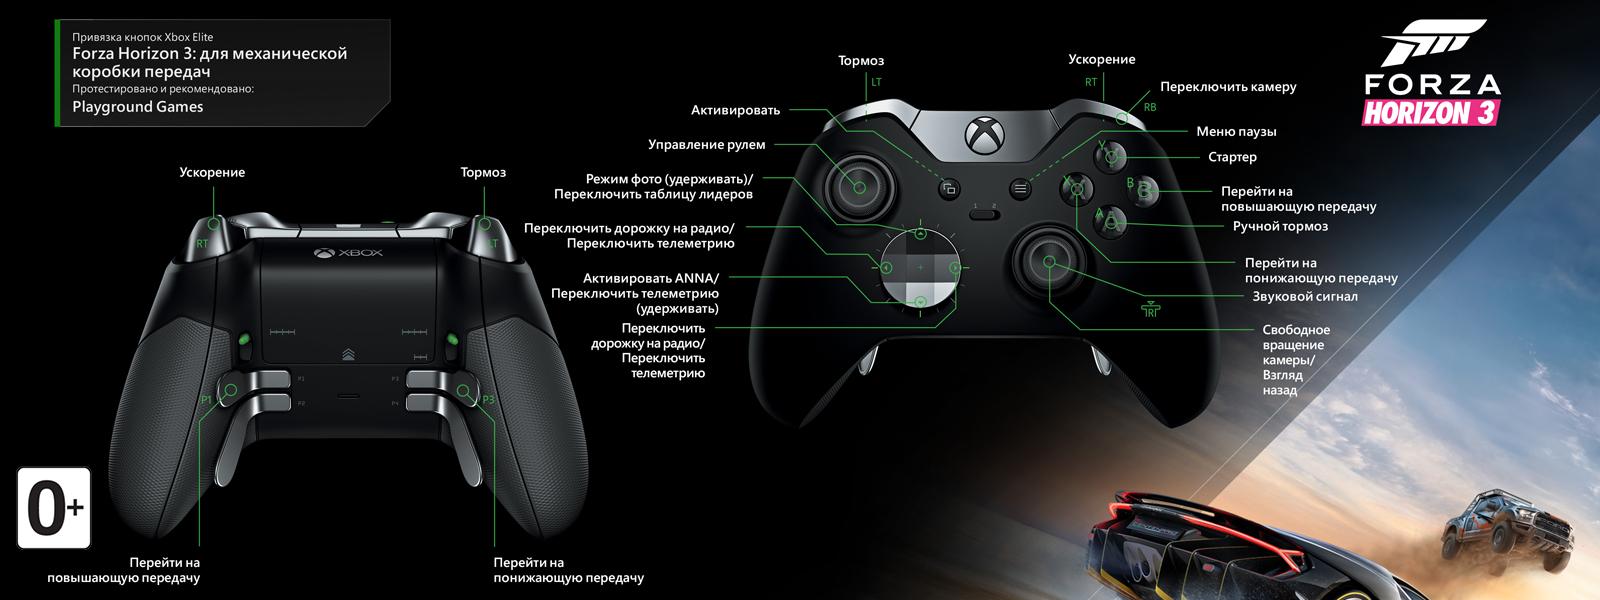 Forza Horizon 3 — раскладка для ручной коробки передач под геймпад Elite